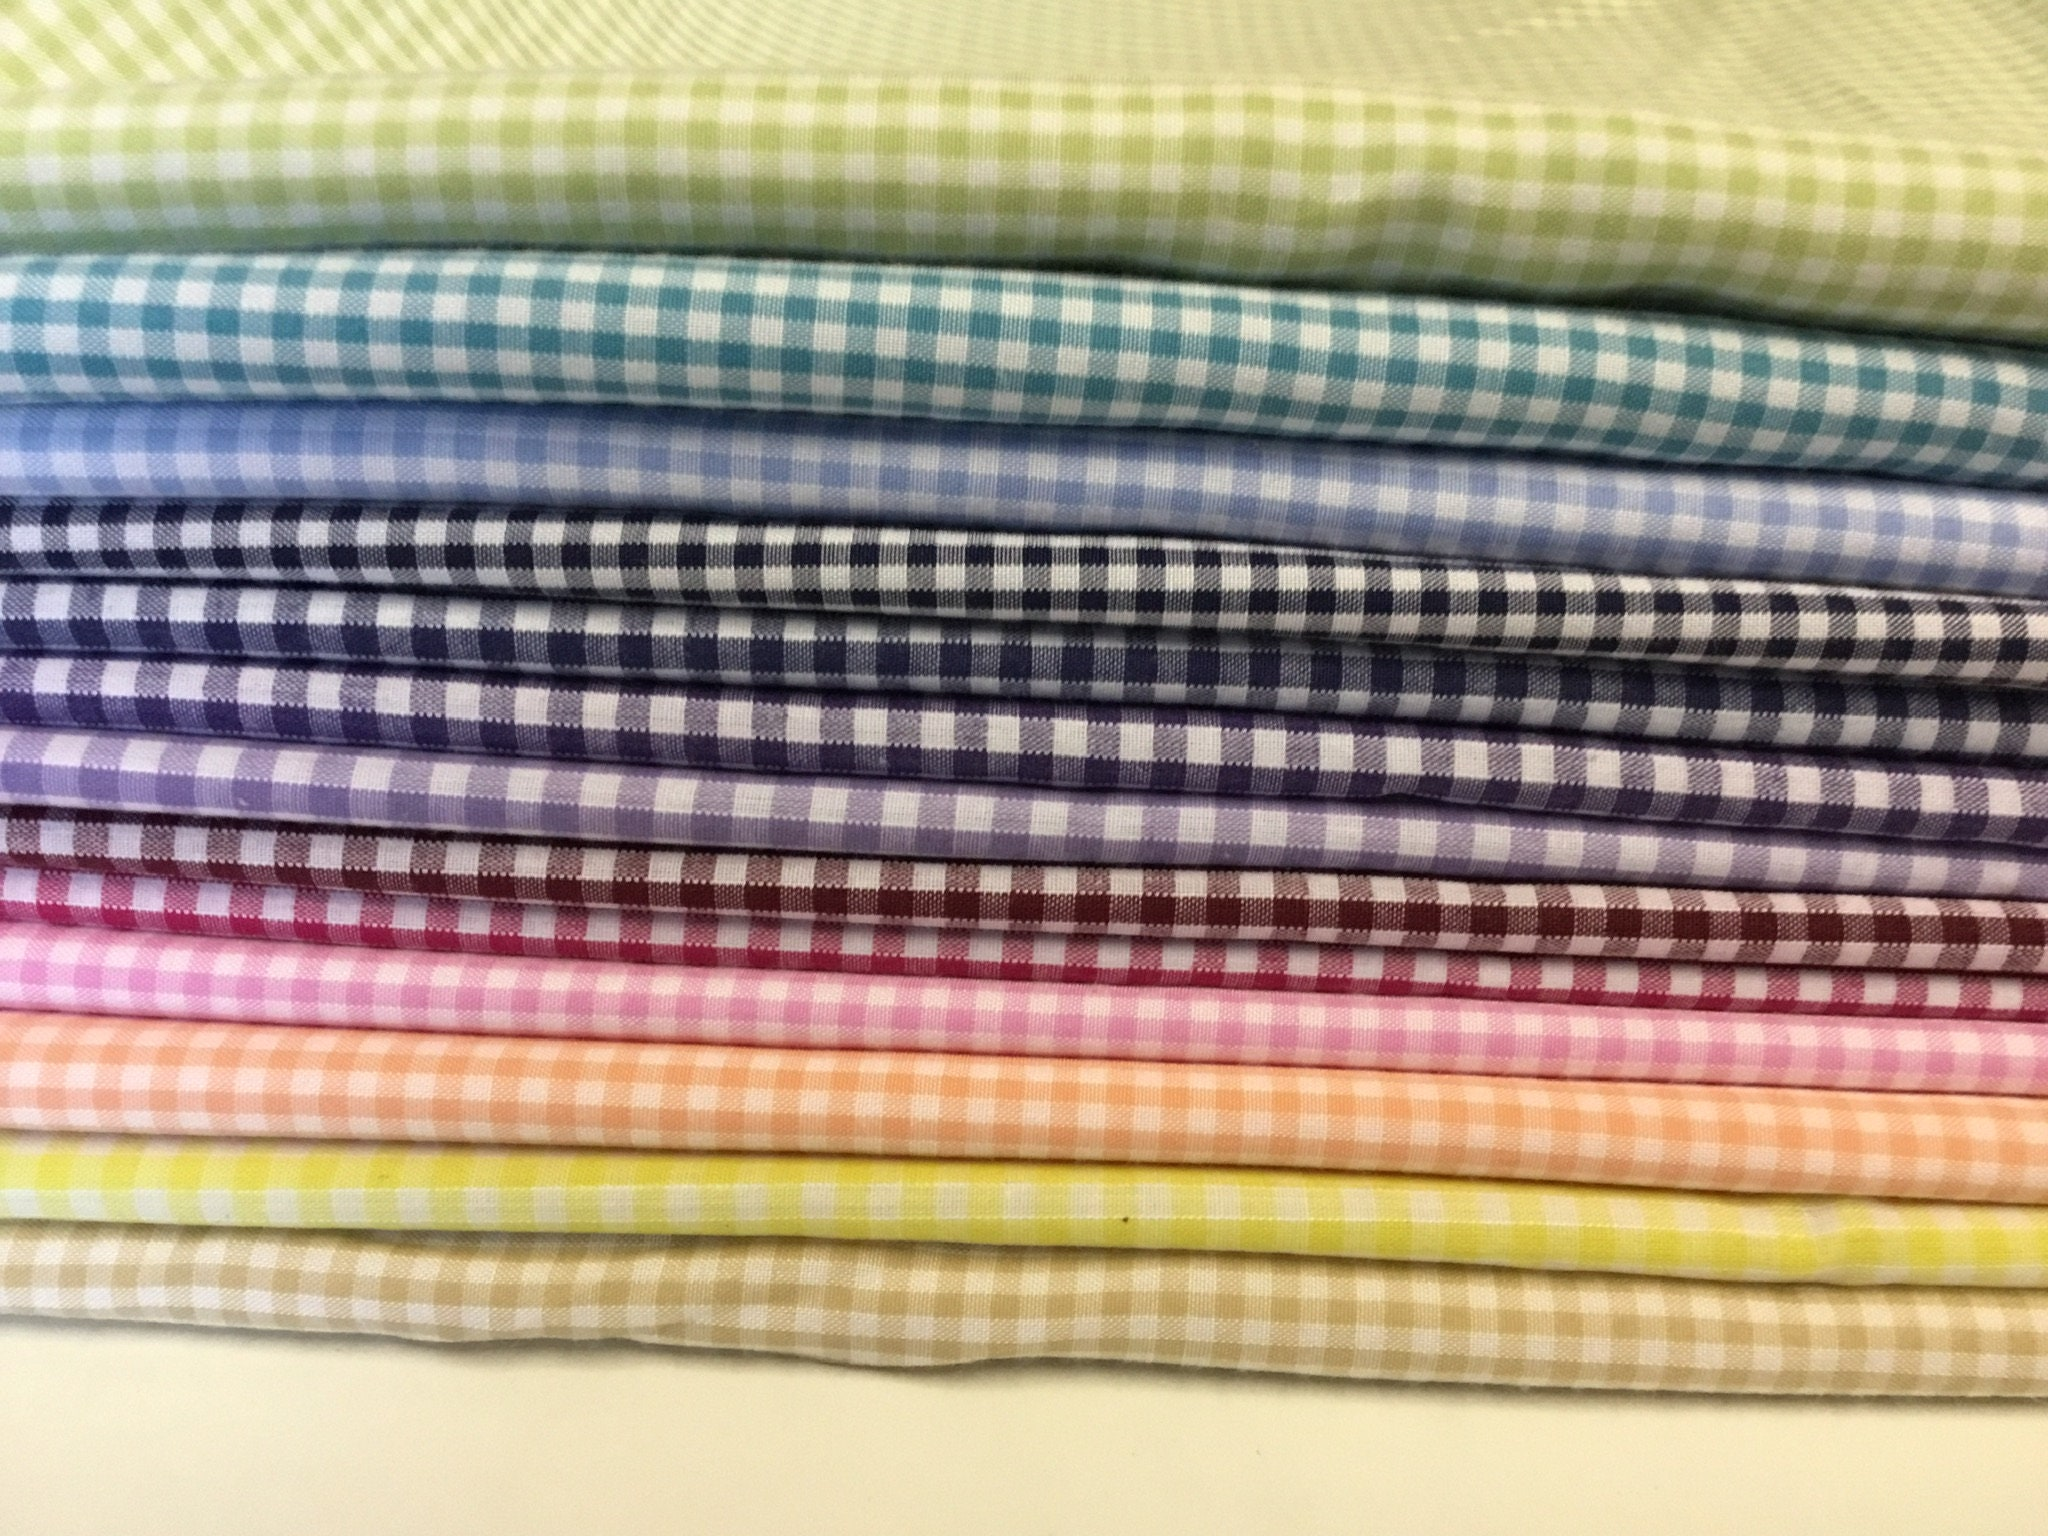 8m50 17pc, each 50cm*1m12 Check poly cotton fabric